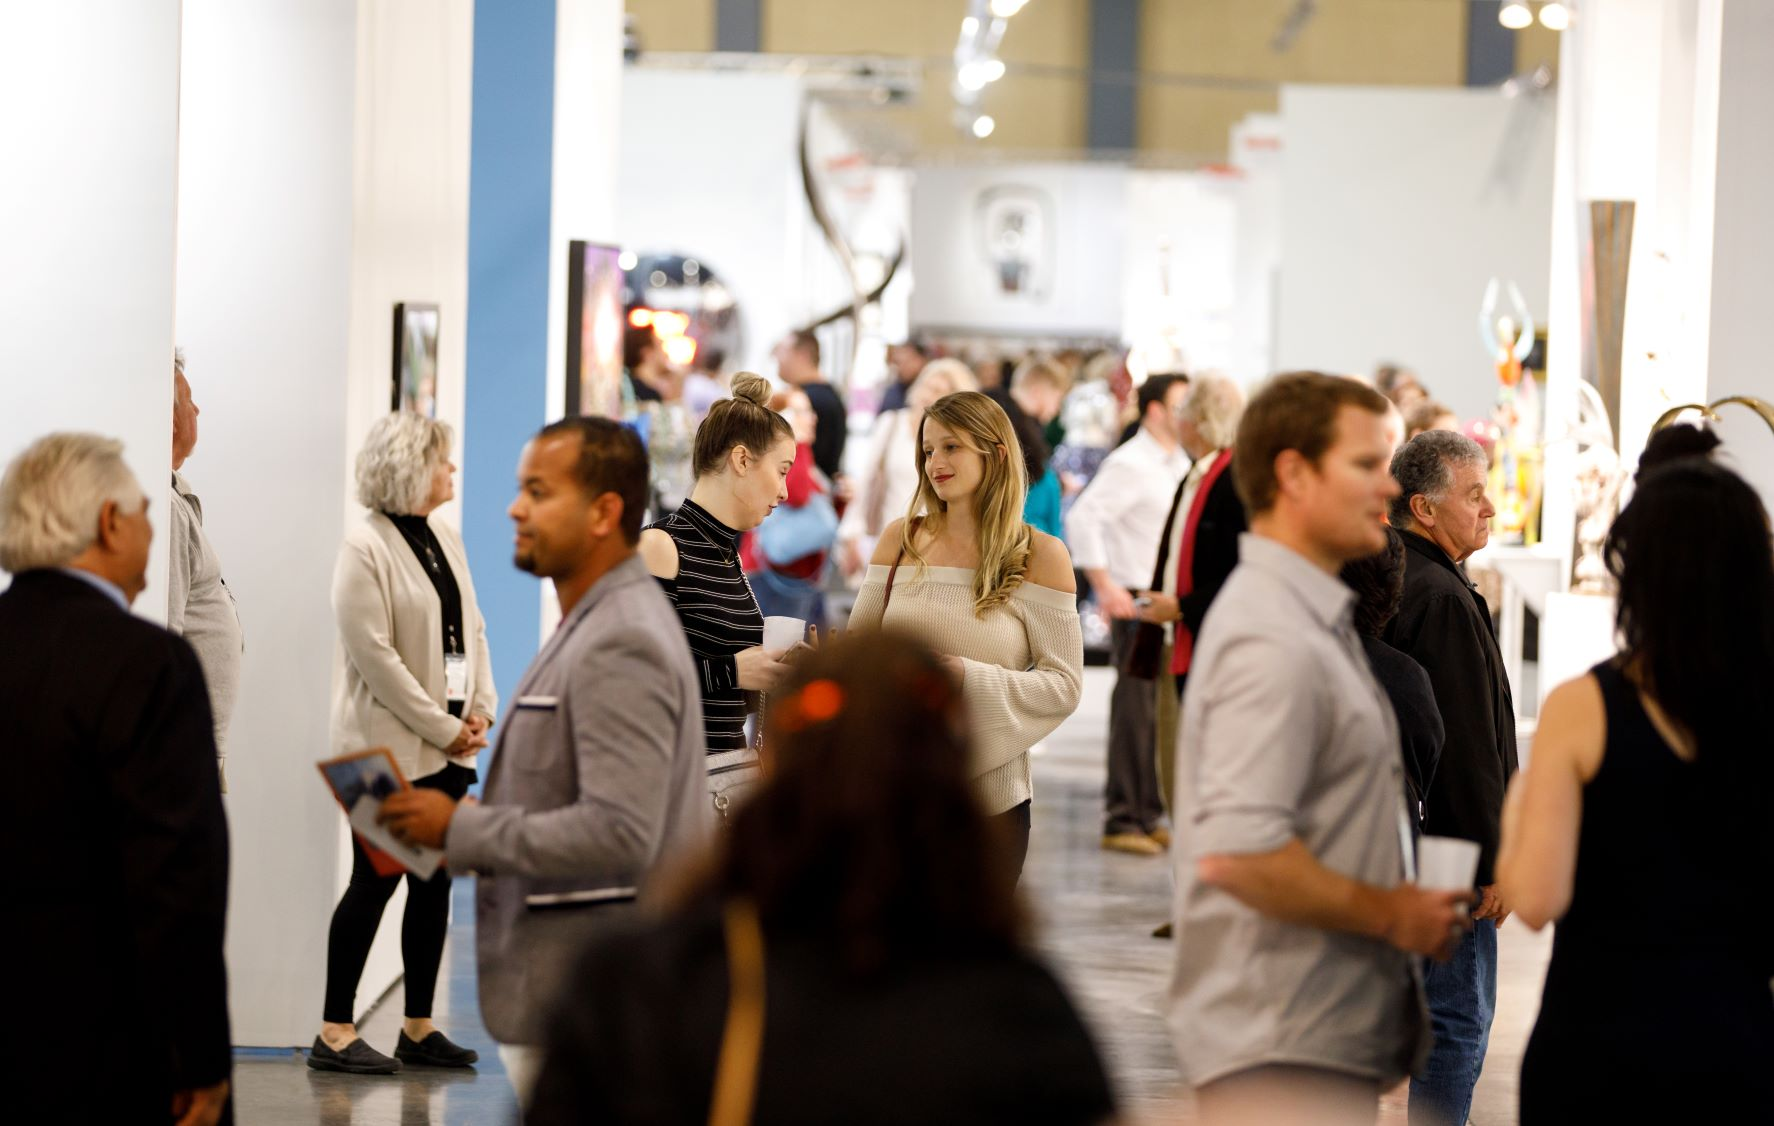 NextlevelFair Contemporary Gallery Design Show